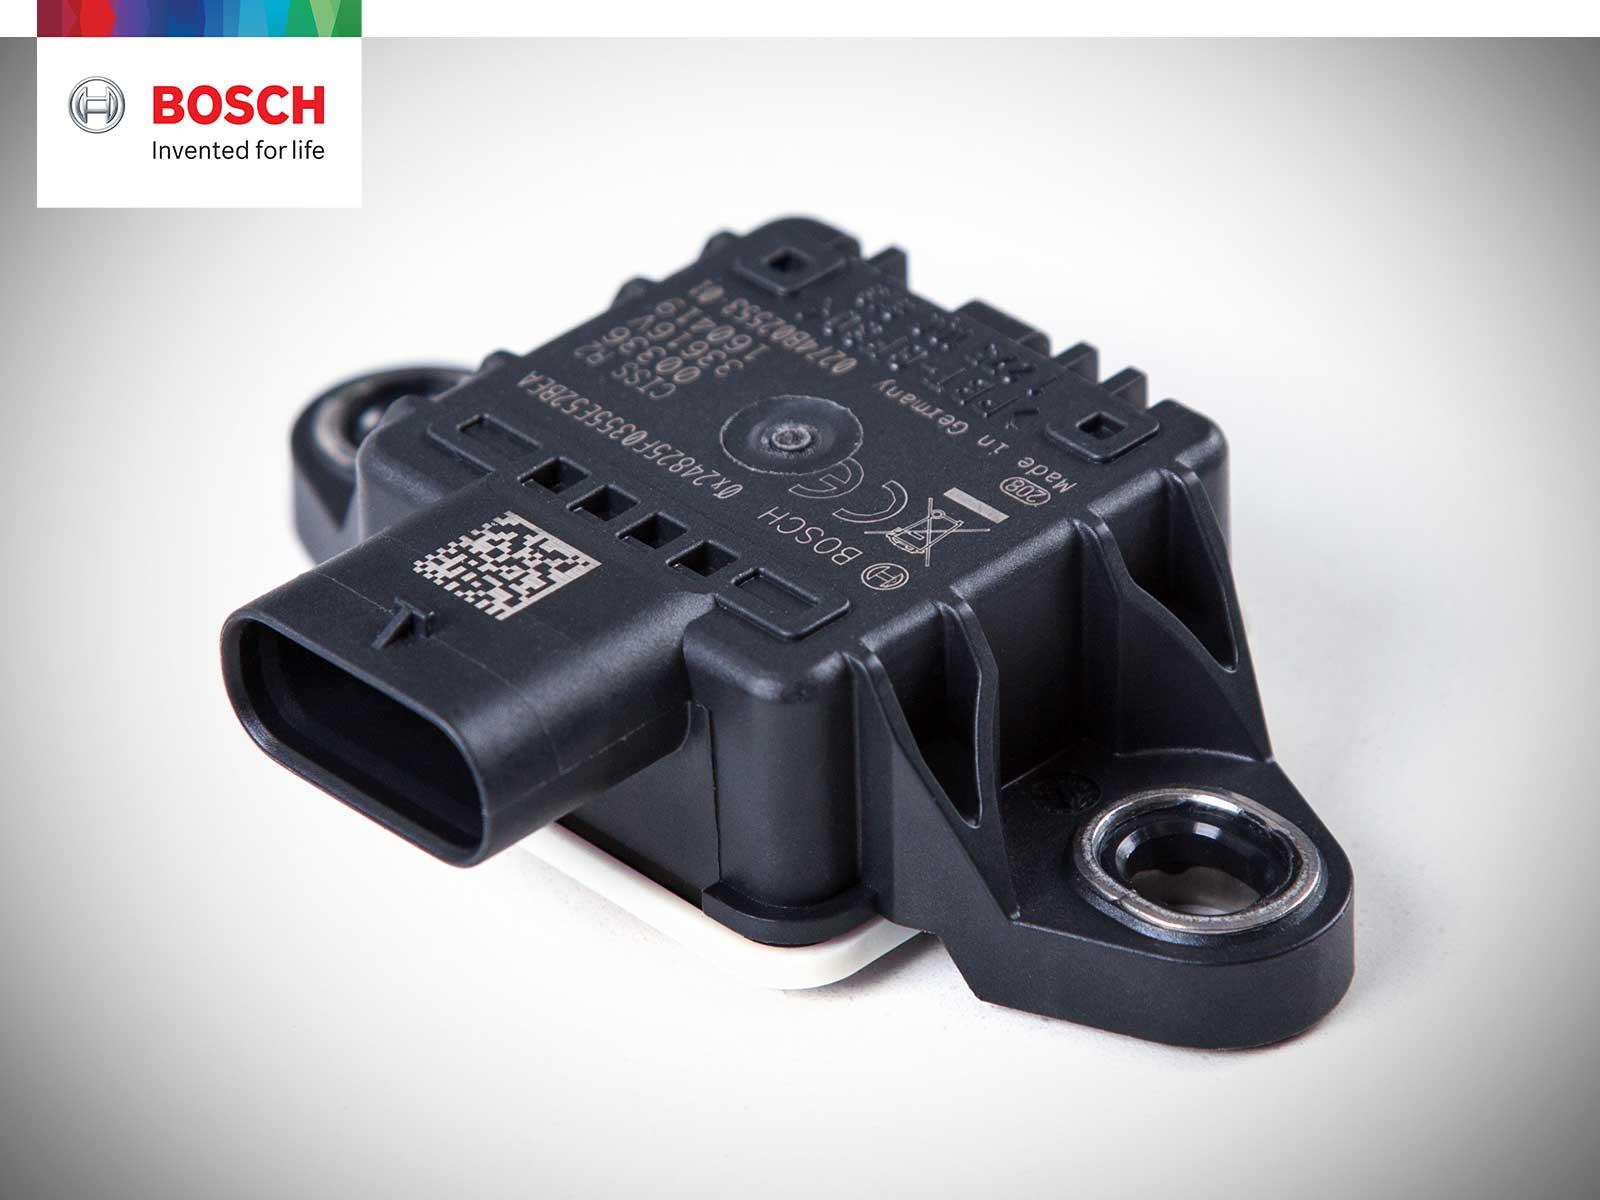 Bluetooth Sensor / CISS - COnnected Industrial Sensor Solution